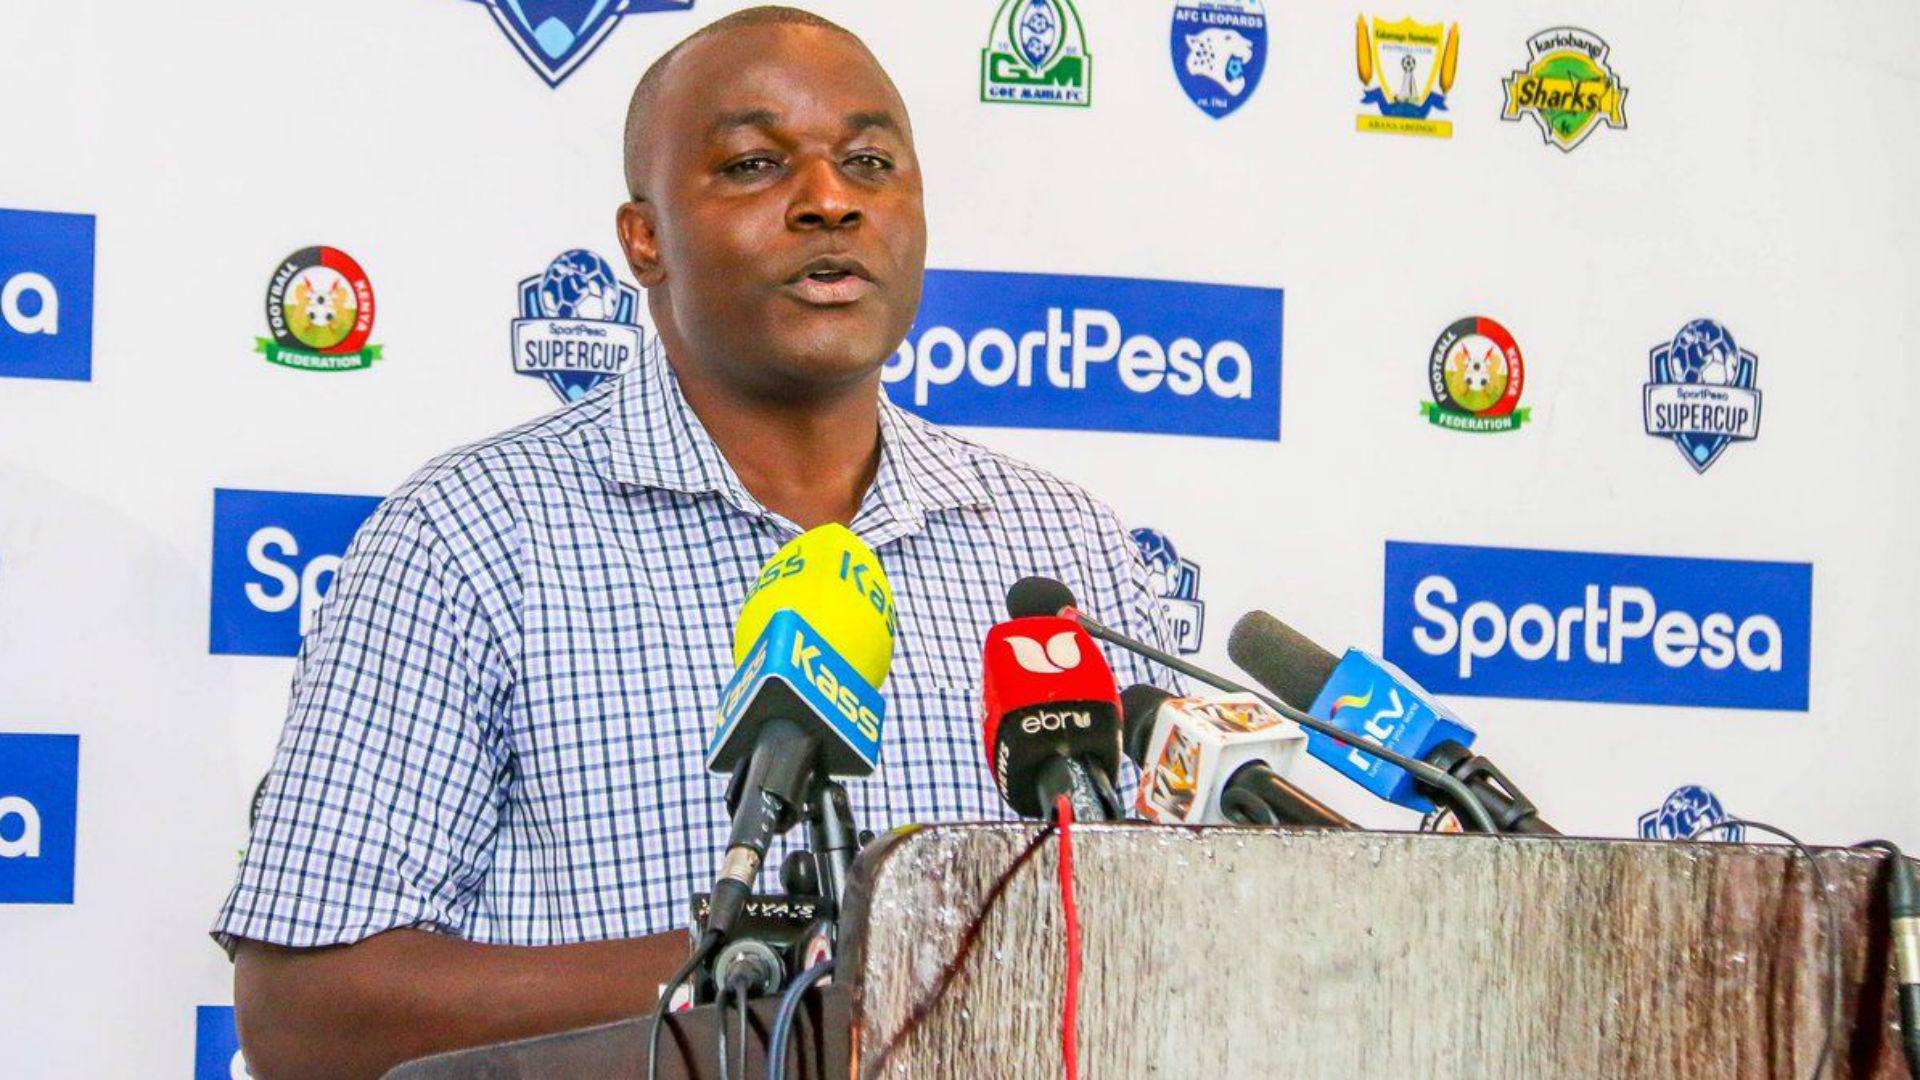 Shimanyula: Kakamega Homeboyz mean business and can win the KPL title | Goal.com